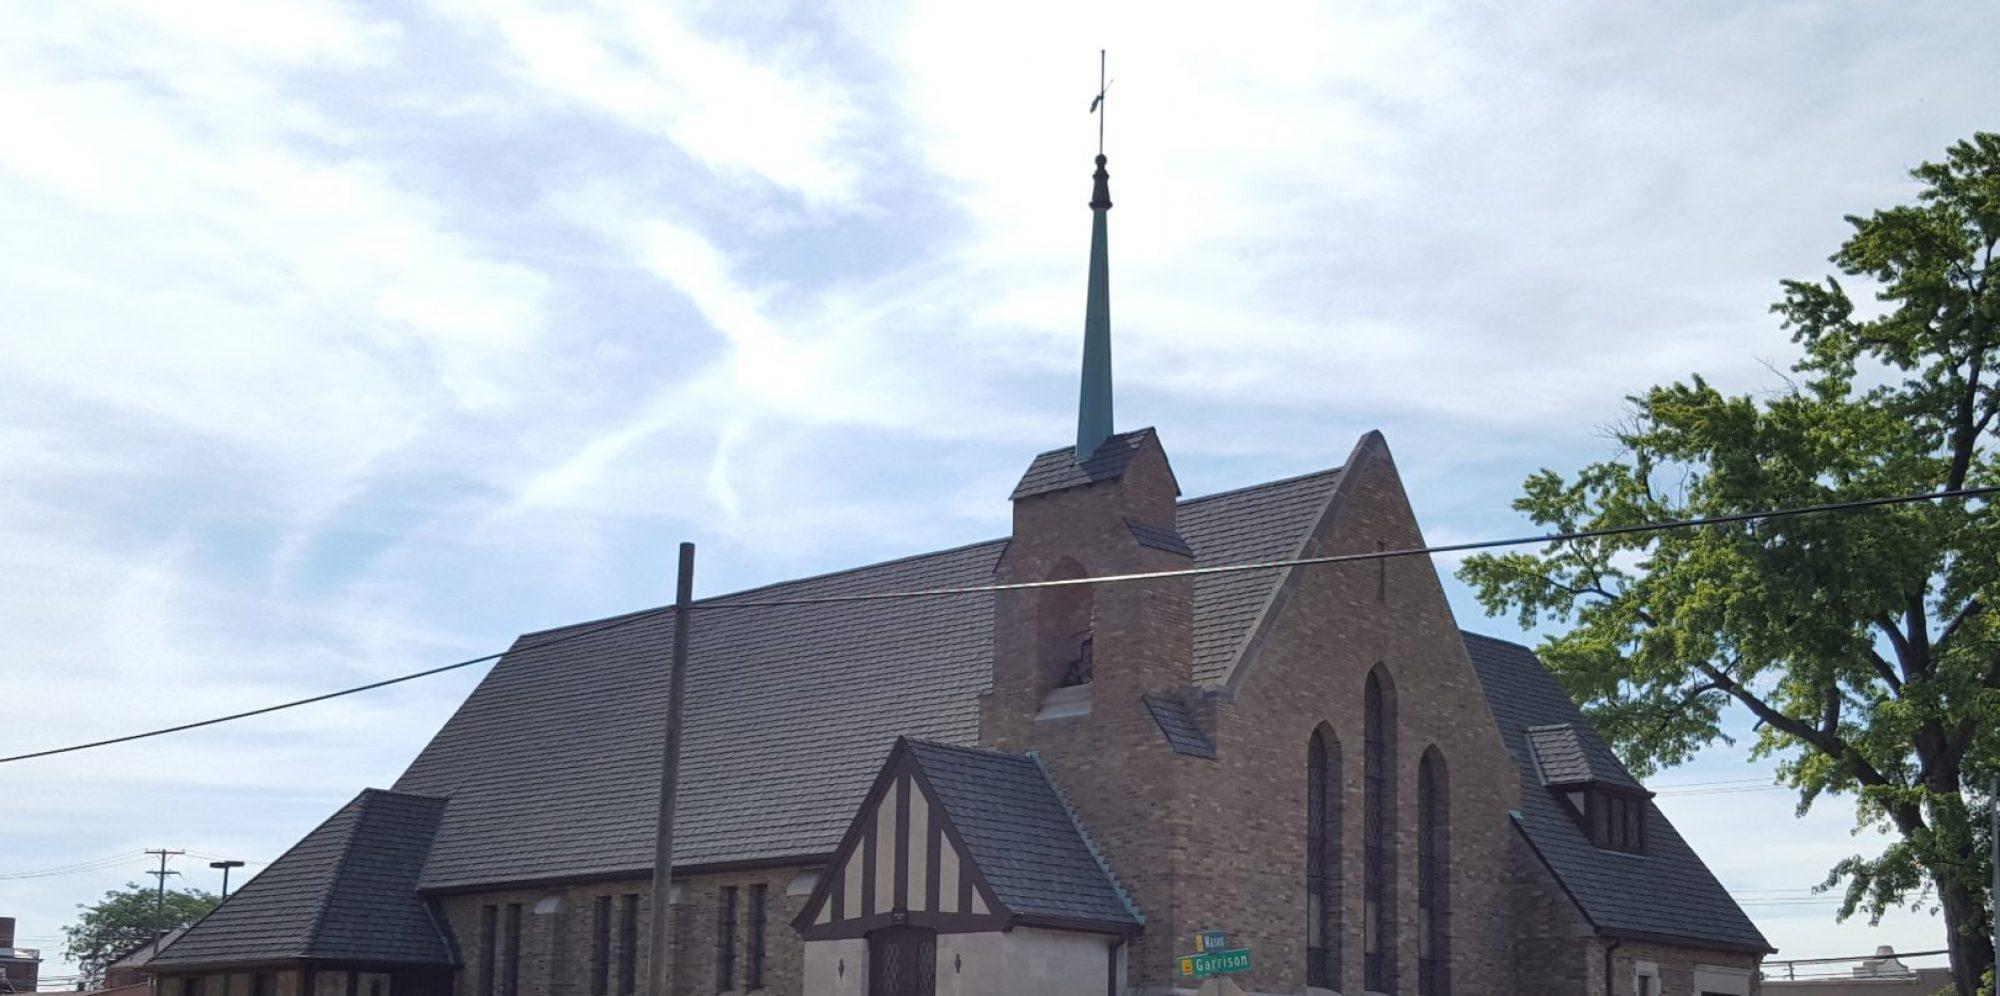 Fairlane Alliance Church